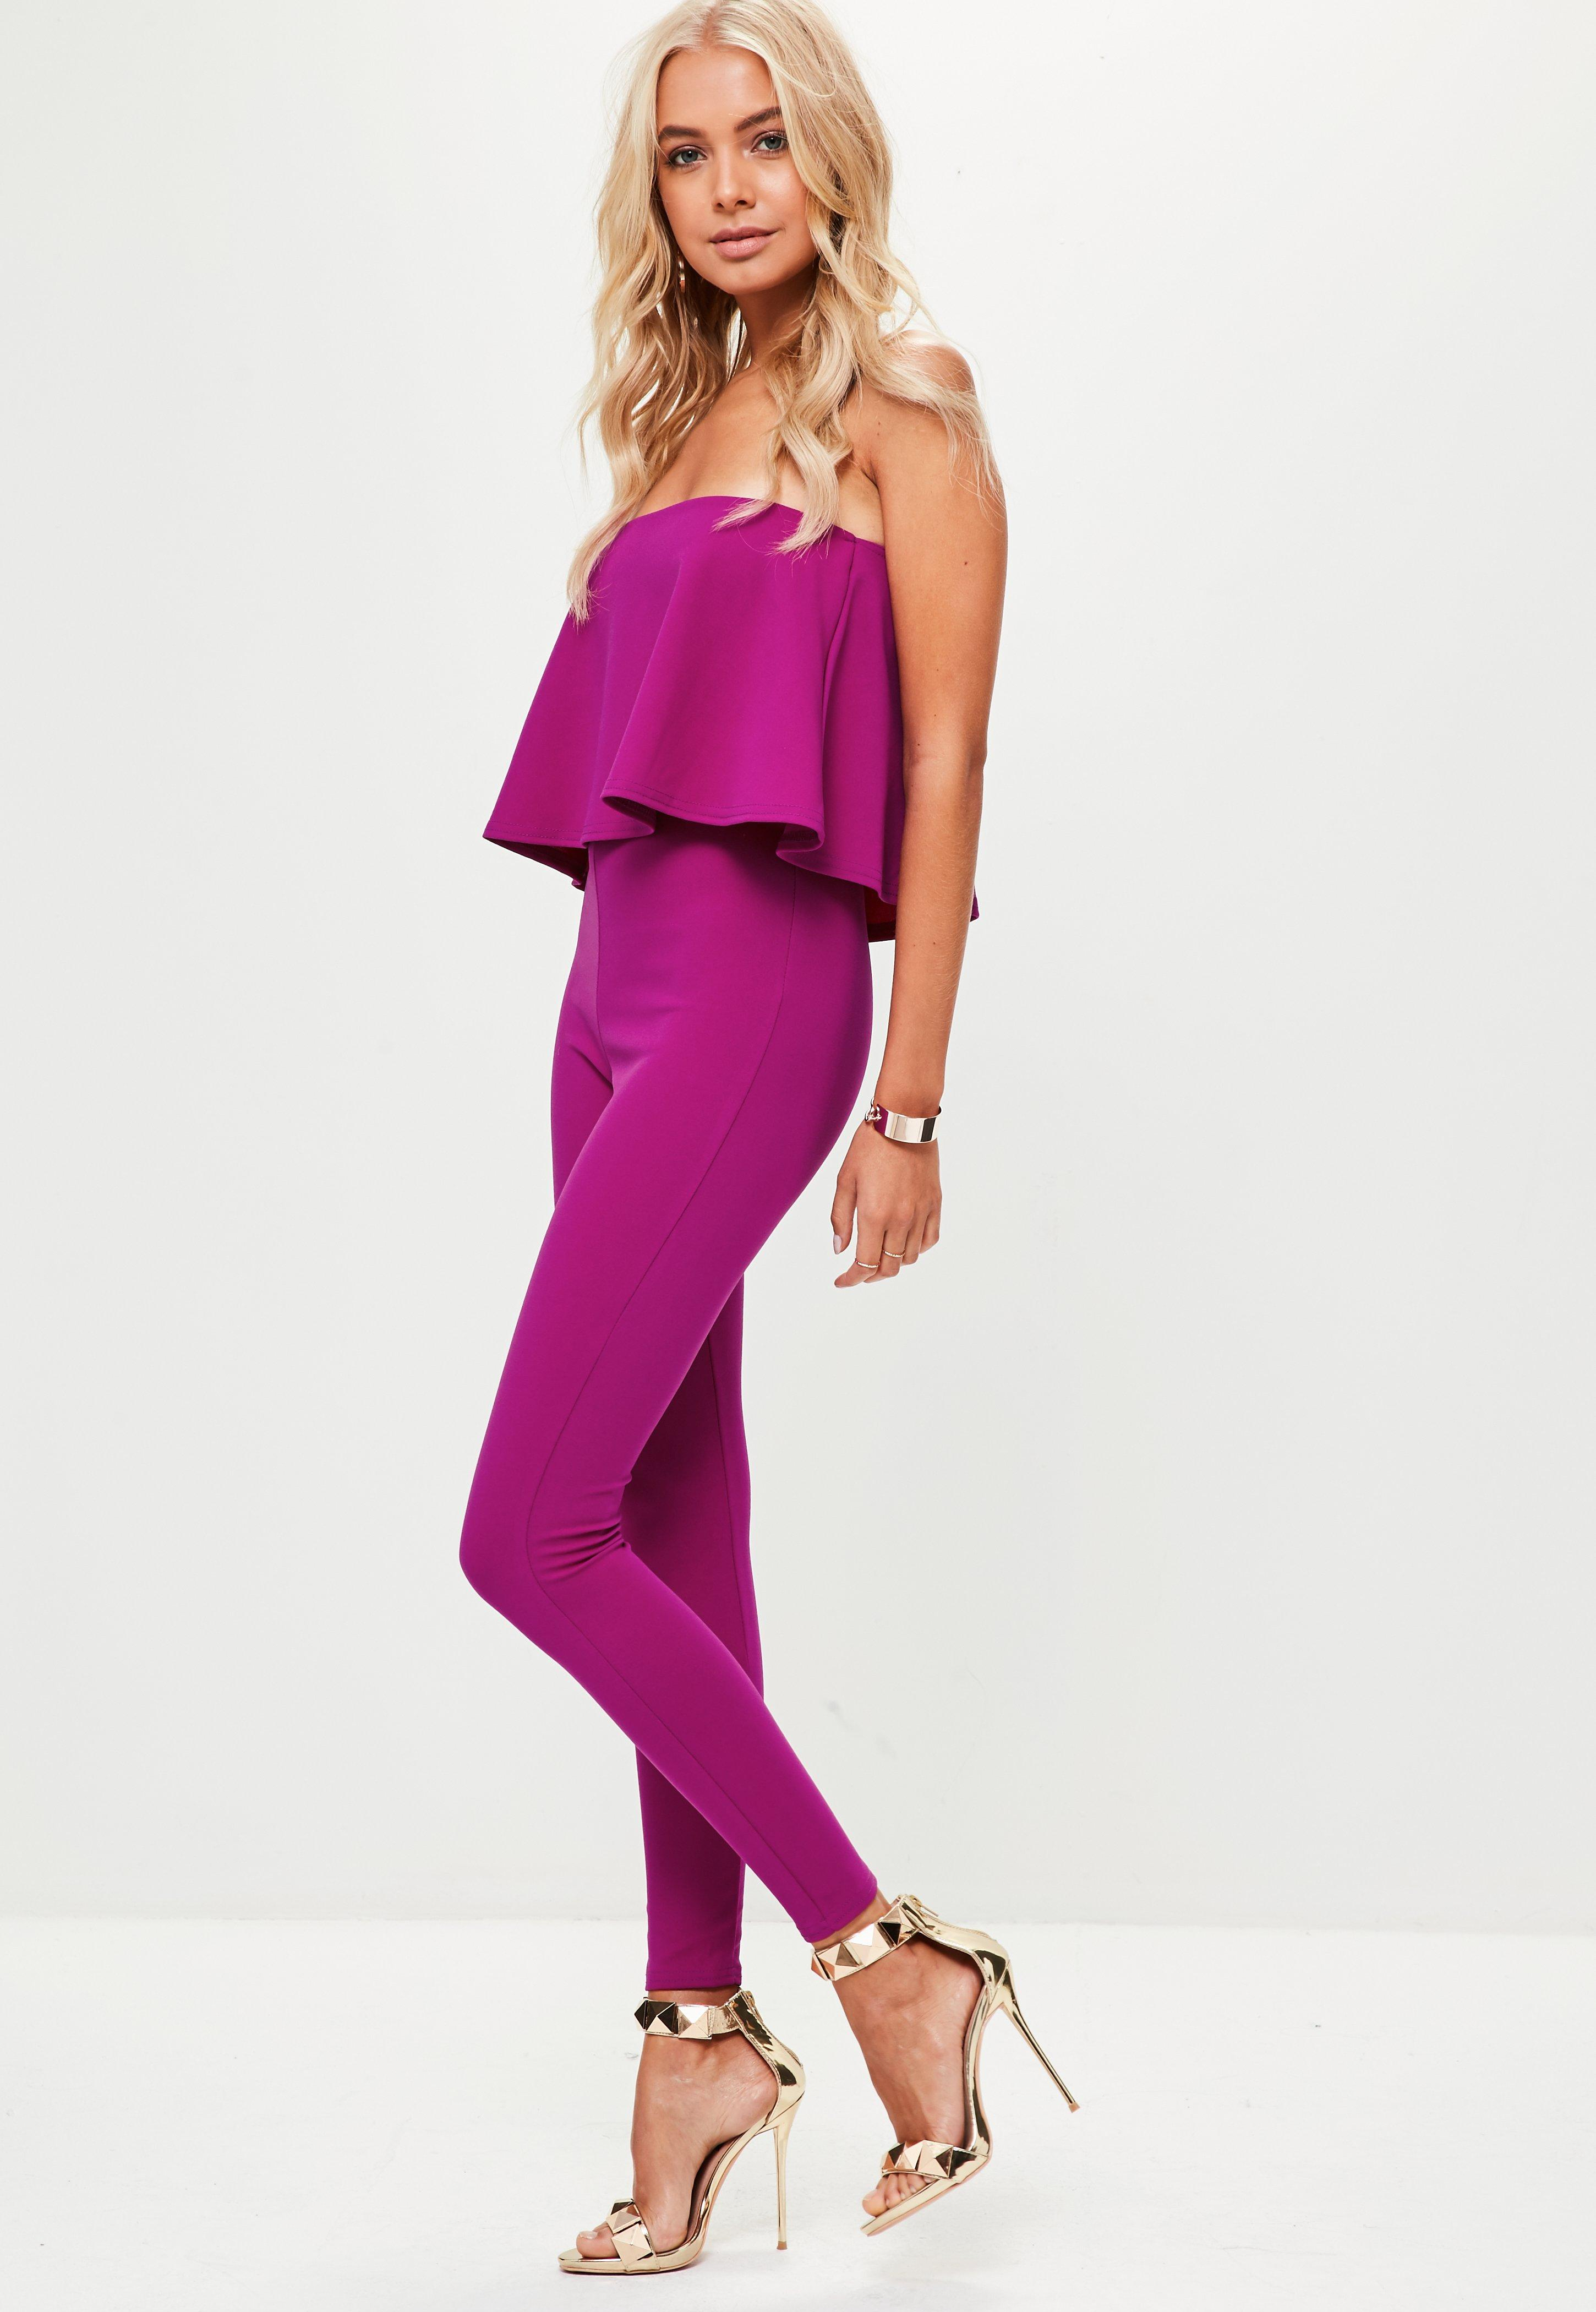 Lyst - Missguided Purple Bandeau Unitard Jumpsuit in Purple